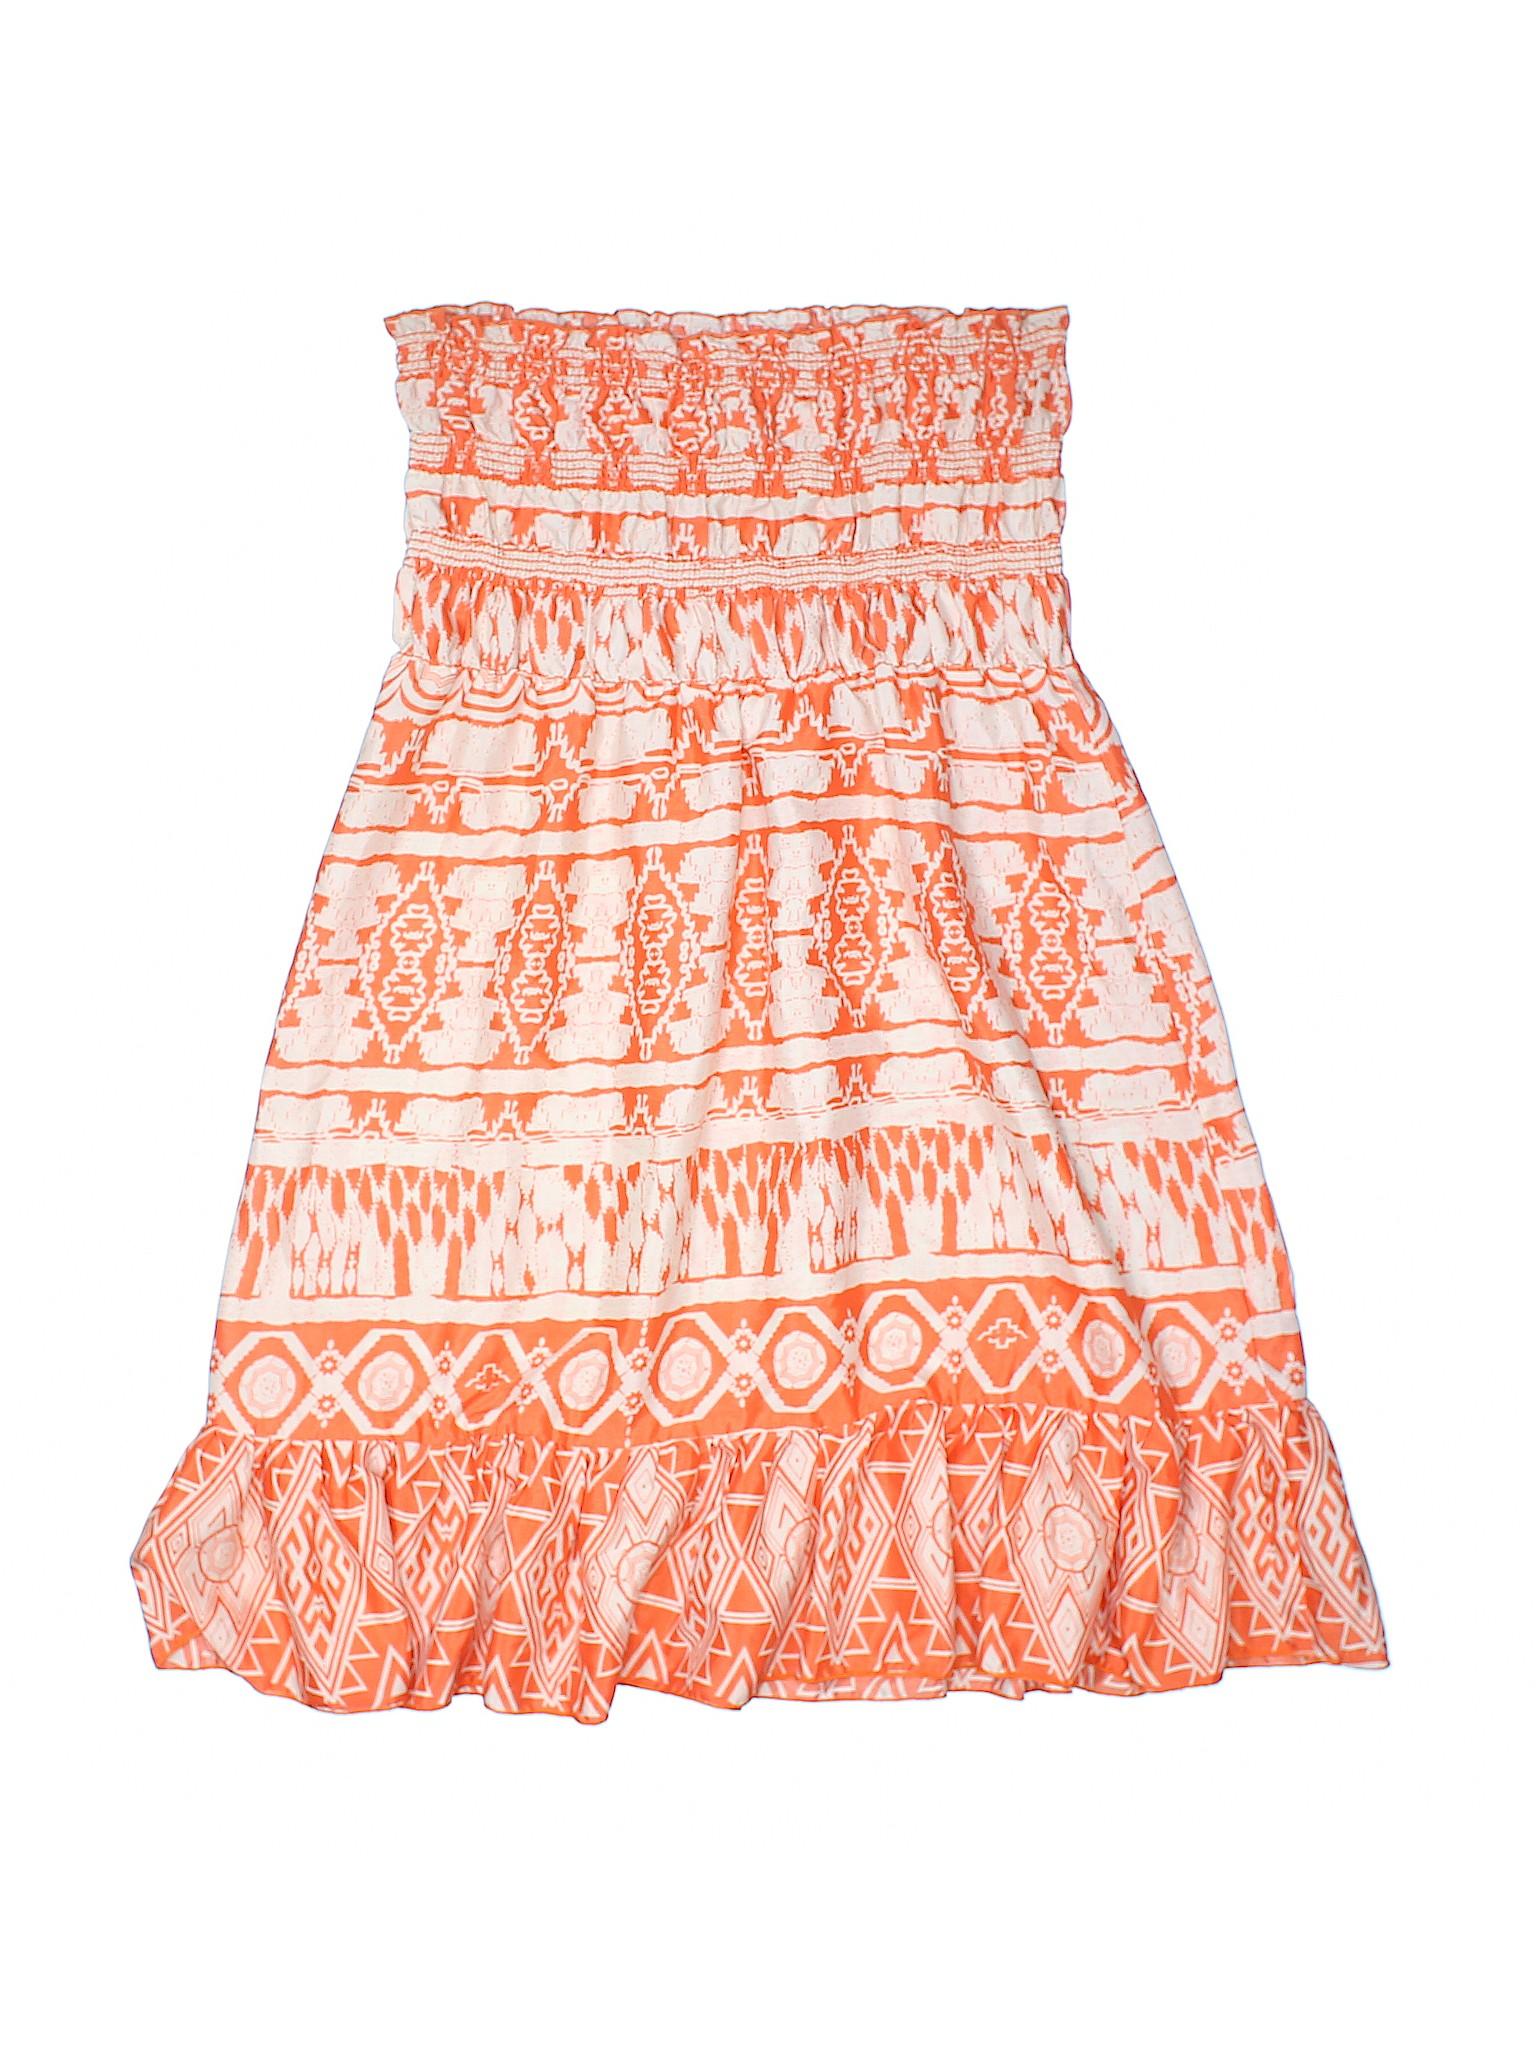 Code winter Mind Boutique Casual Dress qwv1U1OPnS